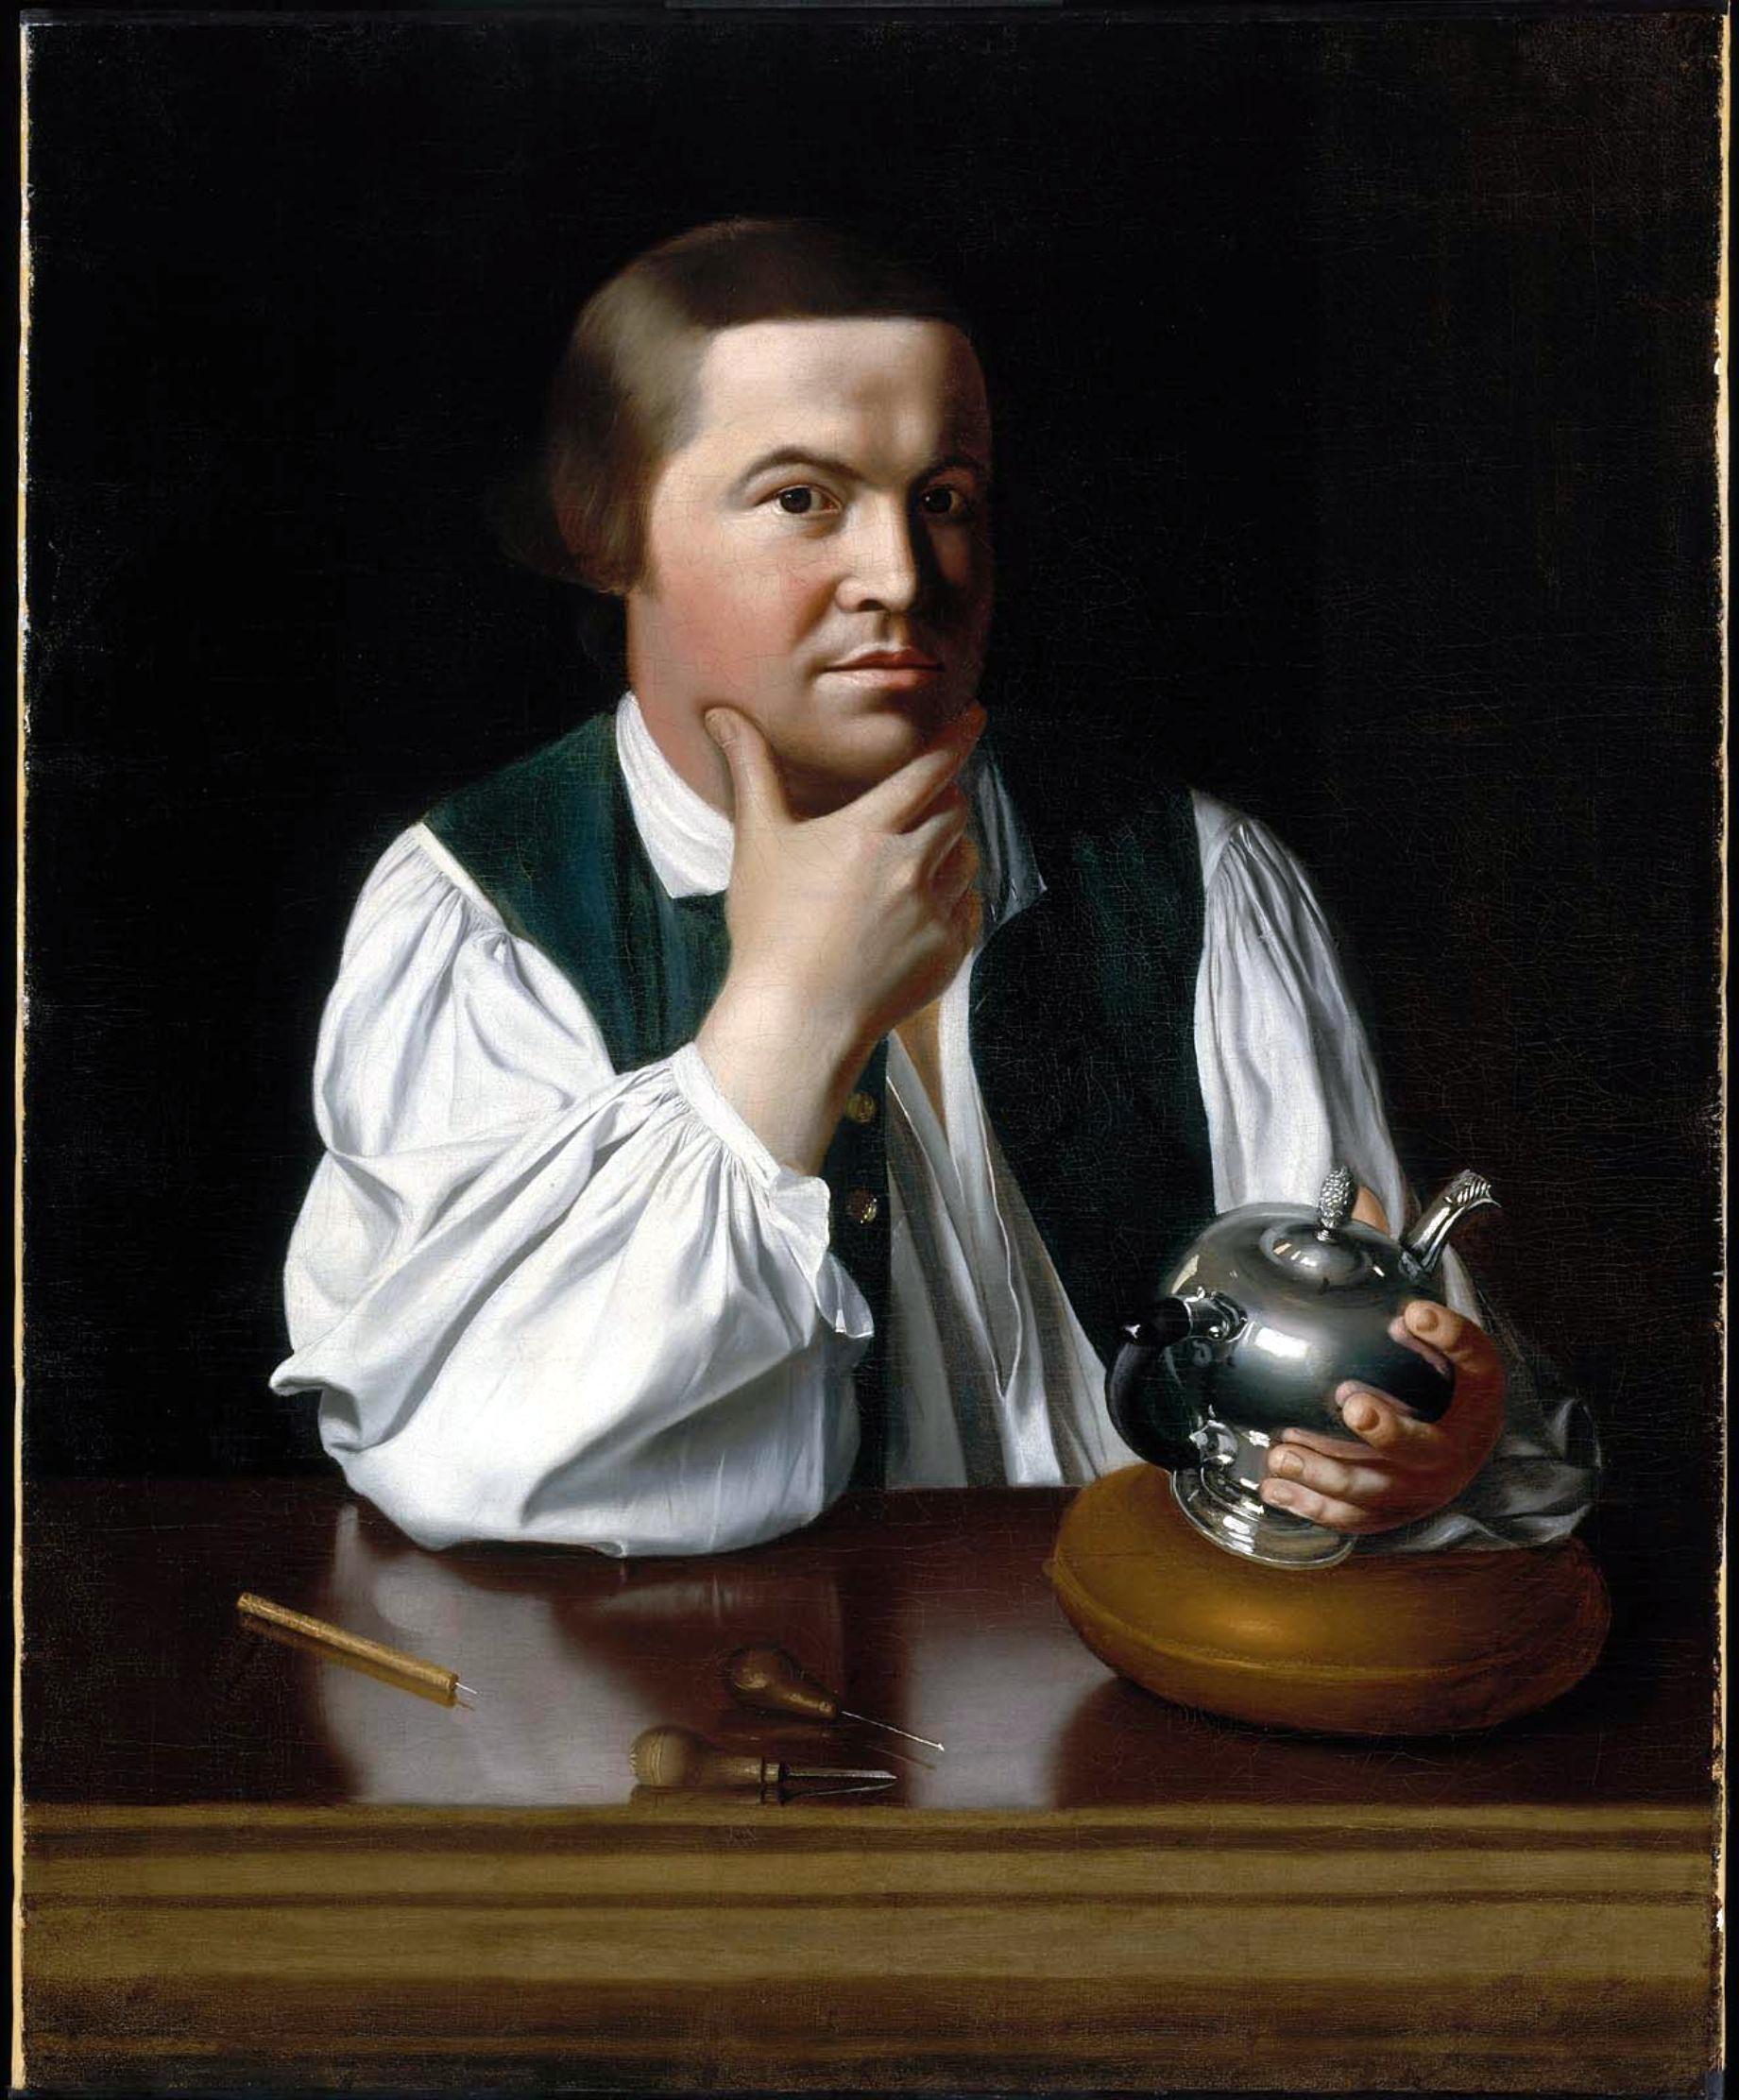 """Portrait of Paul Revere"" by John Singleton Copley licensed under CC BY 2.0"